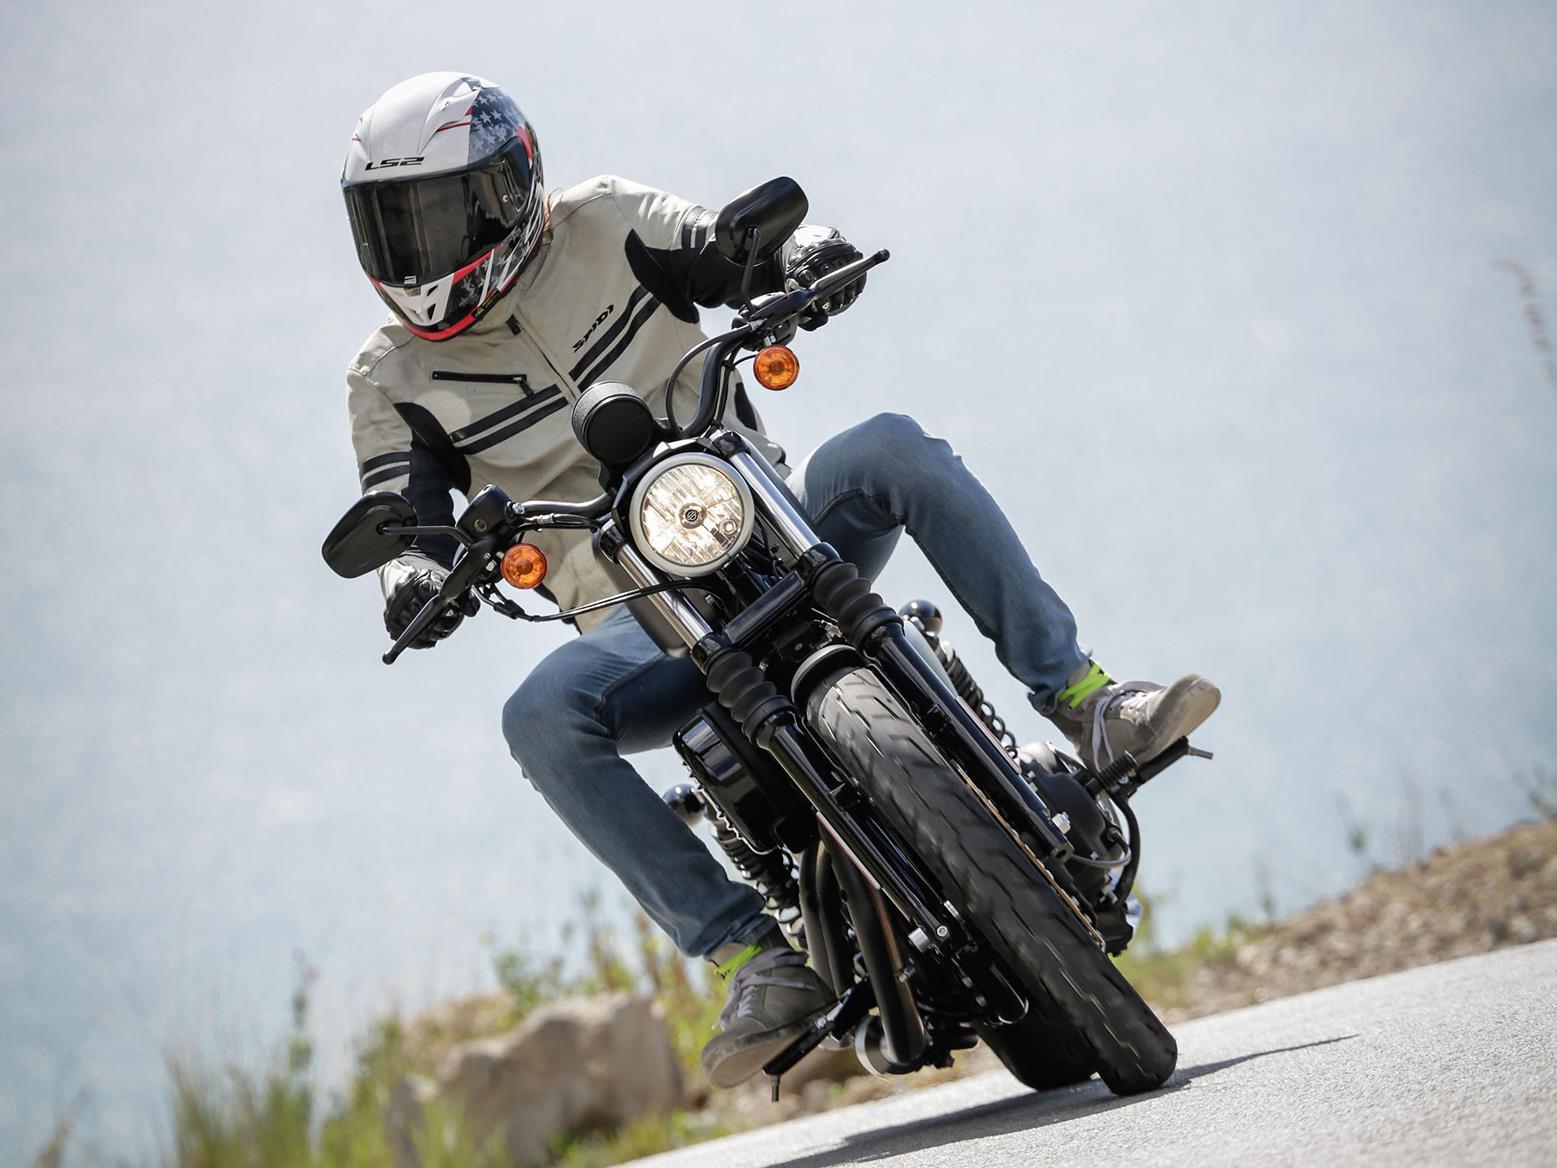 Harley-Davidson Iron 883 front